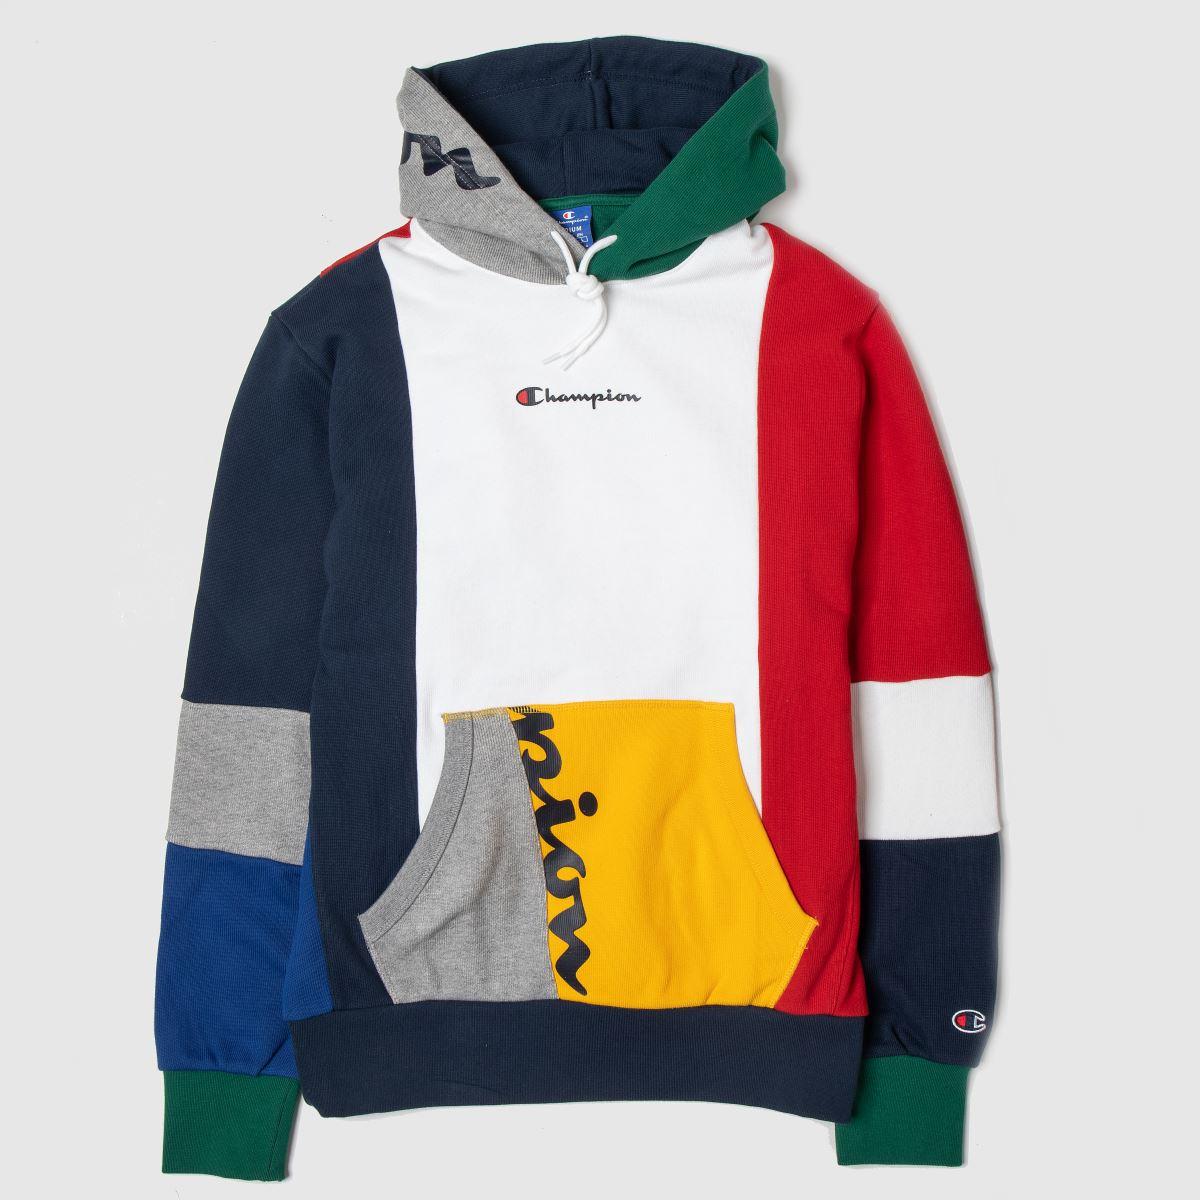 Champion Clothing Champion White & Navy Hooded Sweatshirt